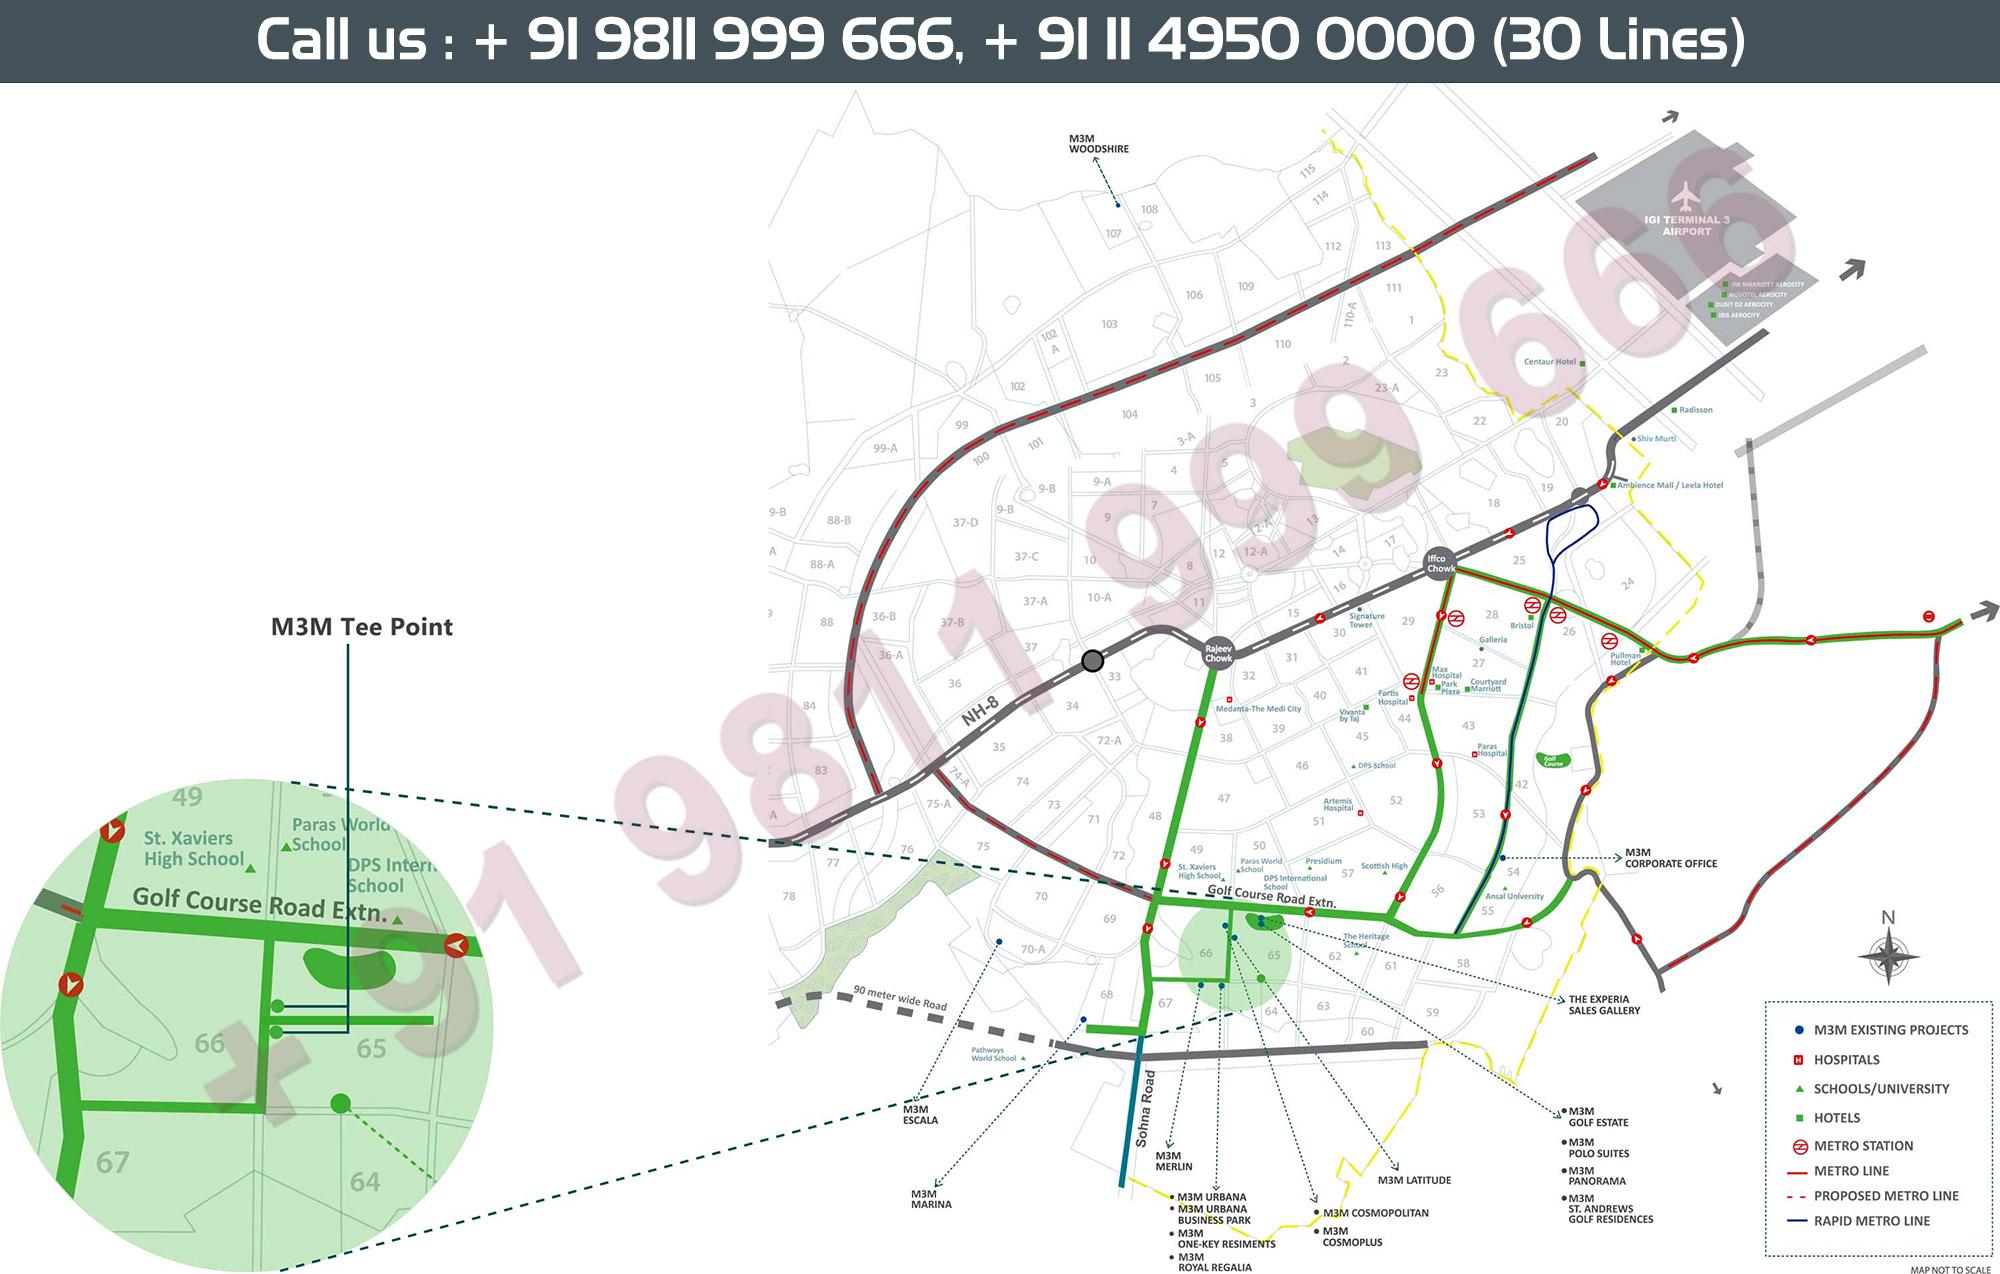 Location Map - M3M Tee Point Gurgaon